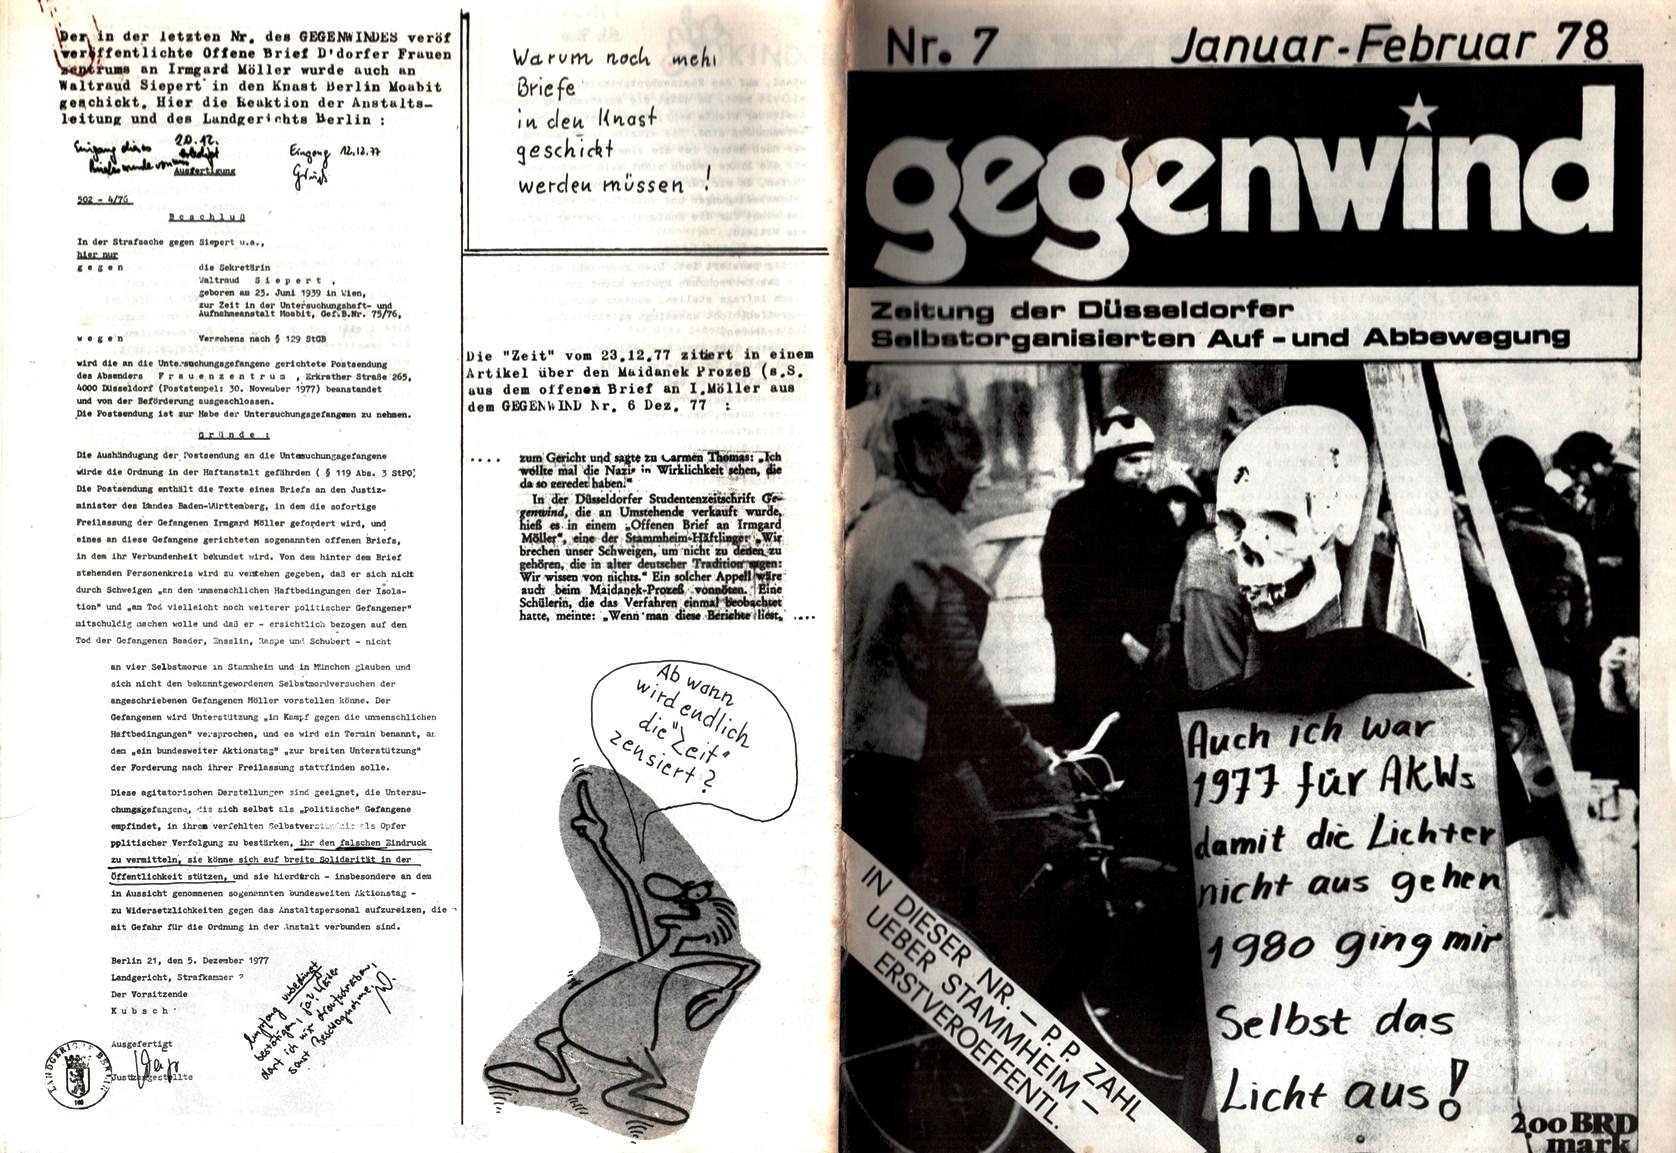 Duesseldorf_Gegenwind_19780200_001